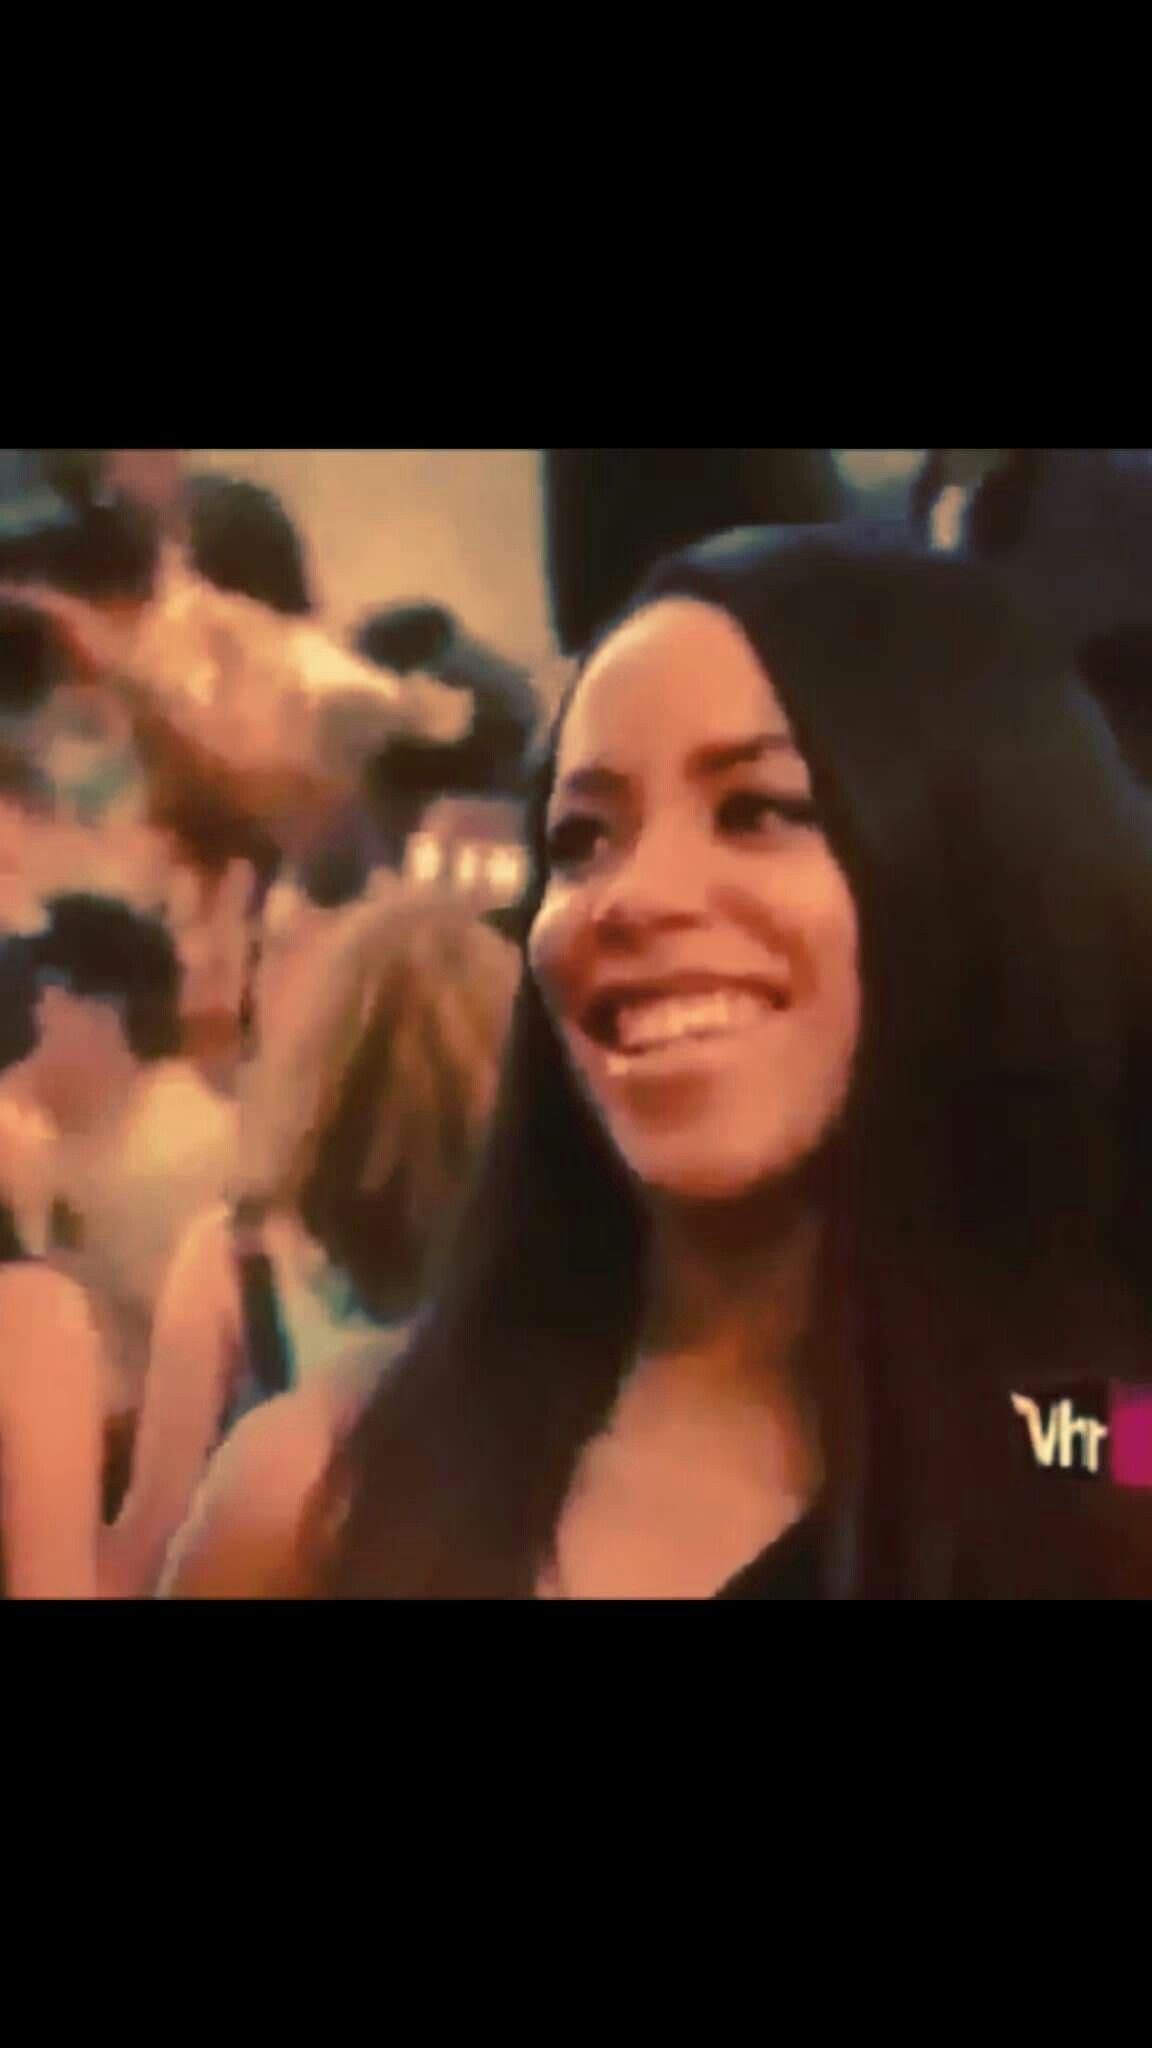 Look At That Beautiful Smile : beautiful, smile, Beautiful, Smile, Aaliyah, Smile,